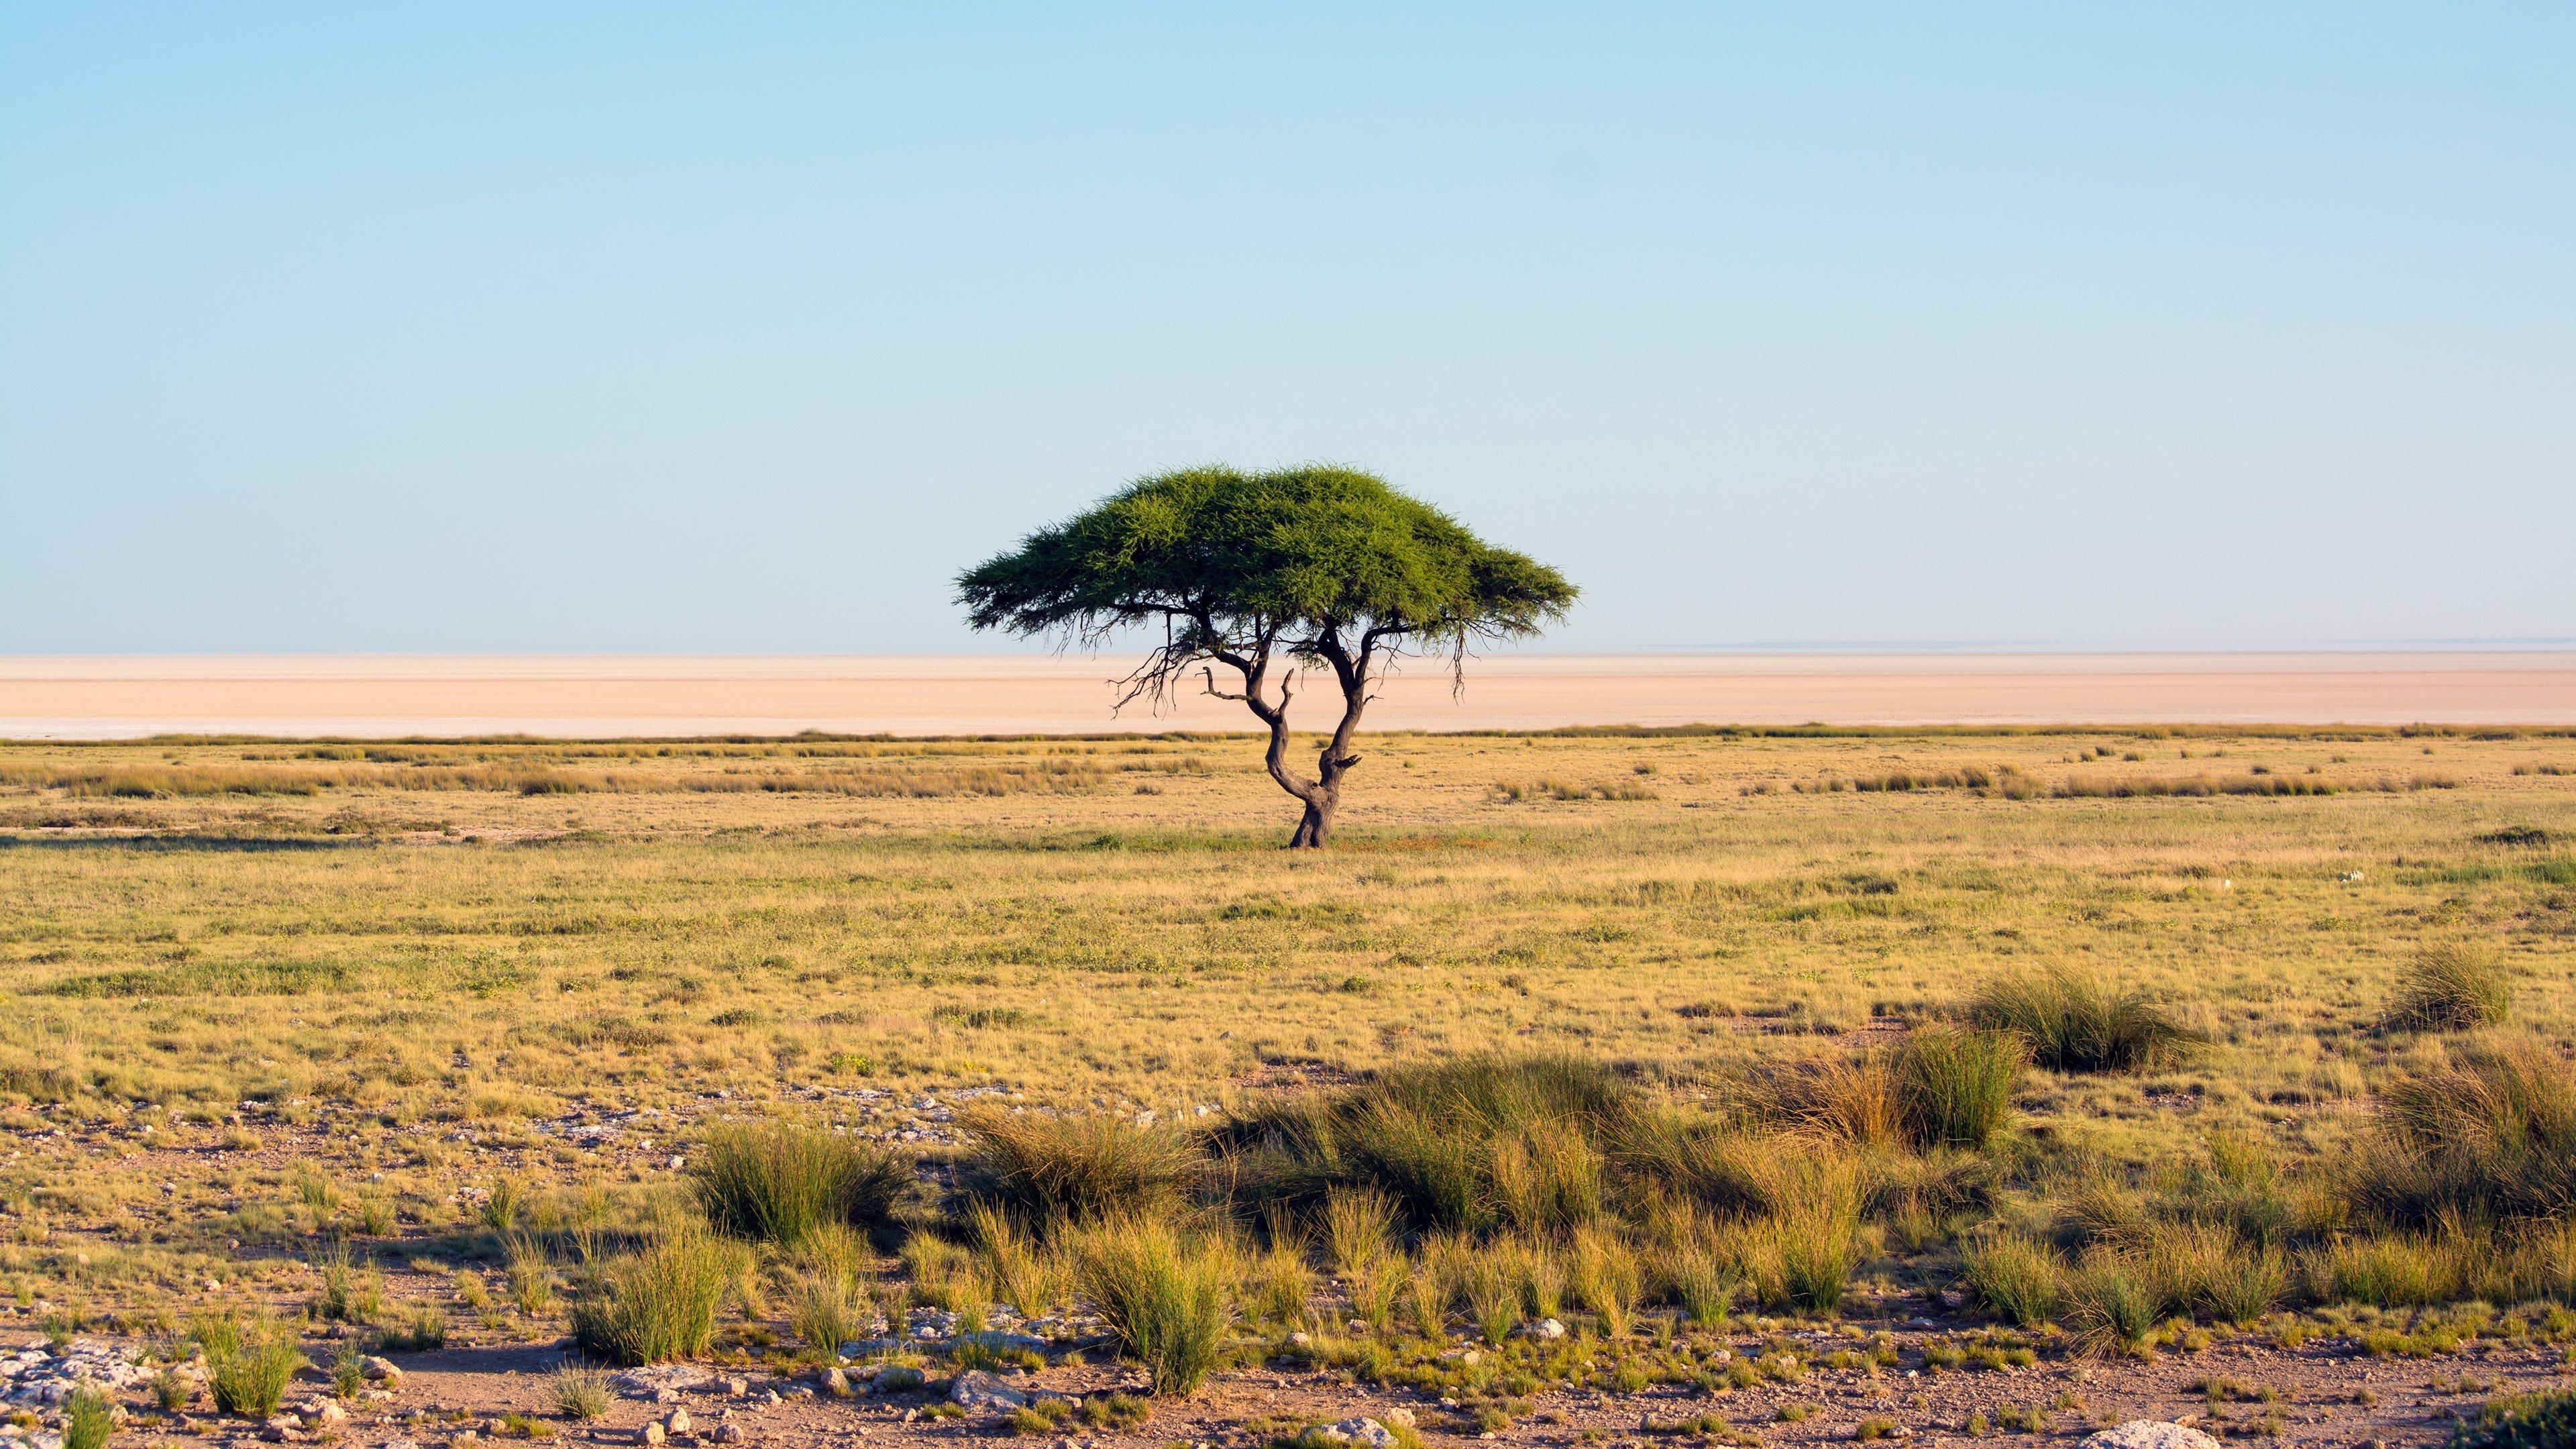 Lonely Tree Landscape Nature Savannah Wallpaper